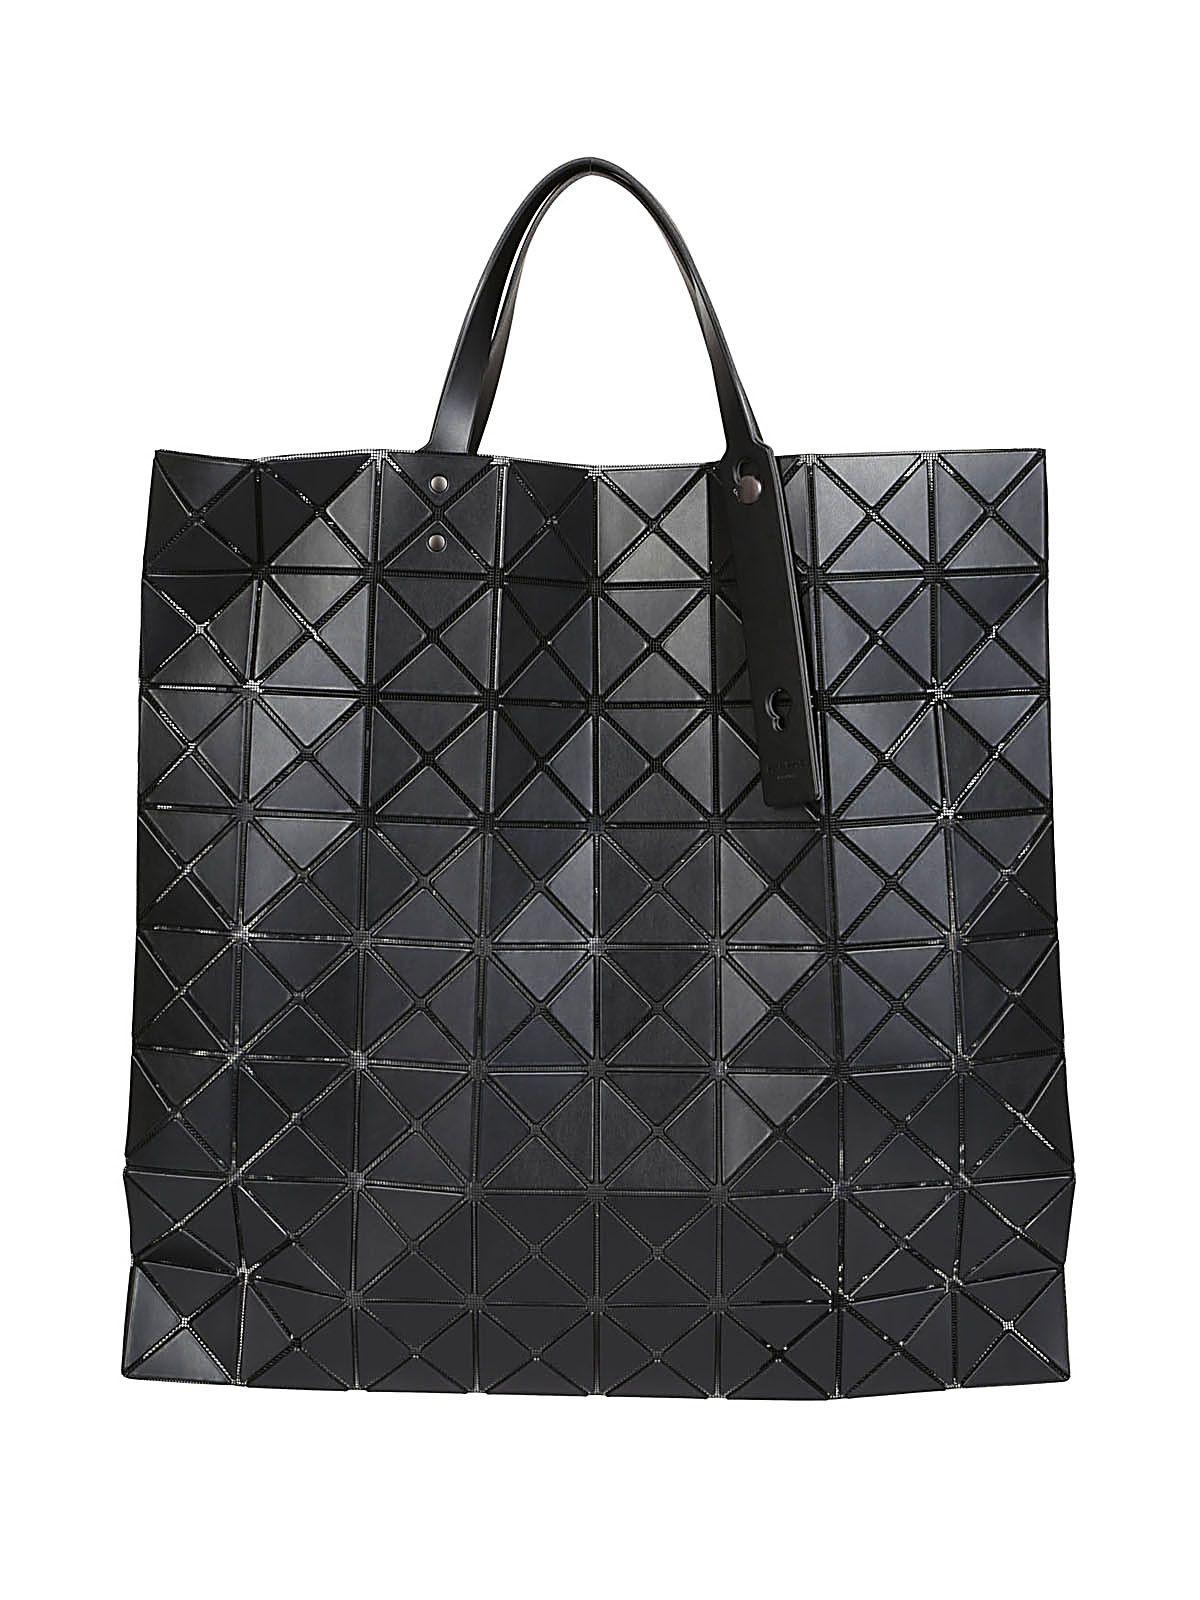 Shopping Online Outlet Sale Wiki Online Bao Bao Issey Miyake triangular embellishment satchel Cheap View AvhHqDf